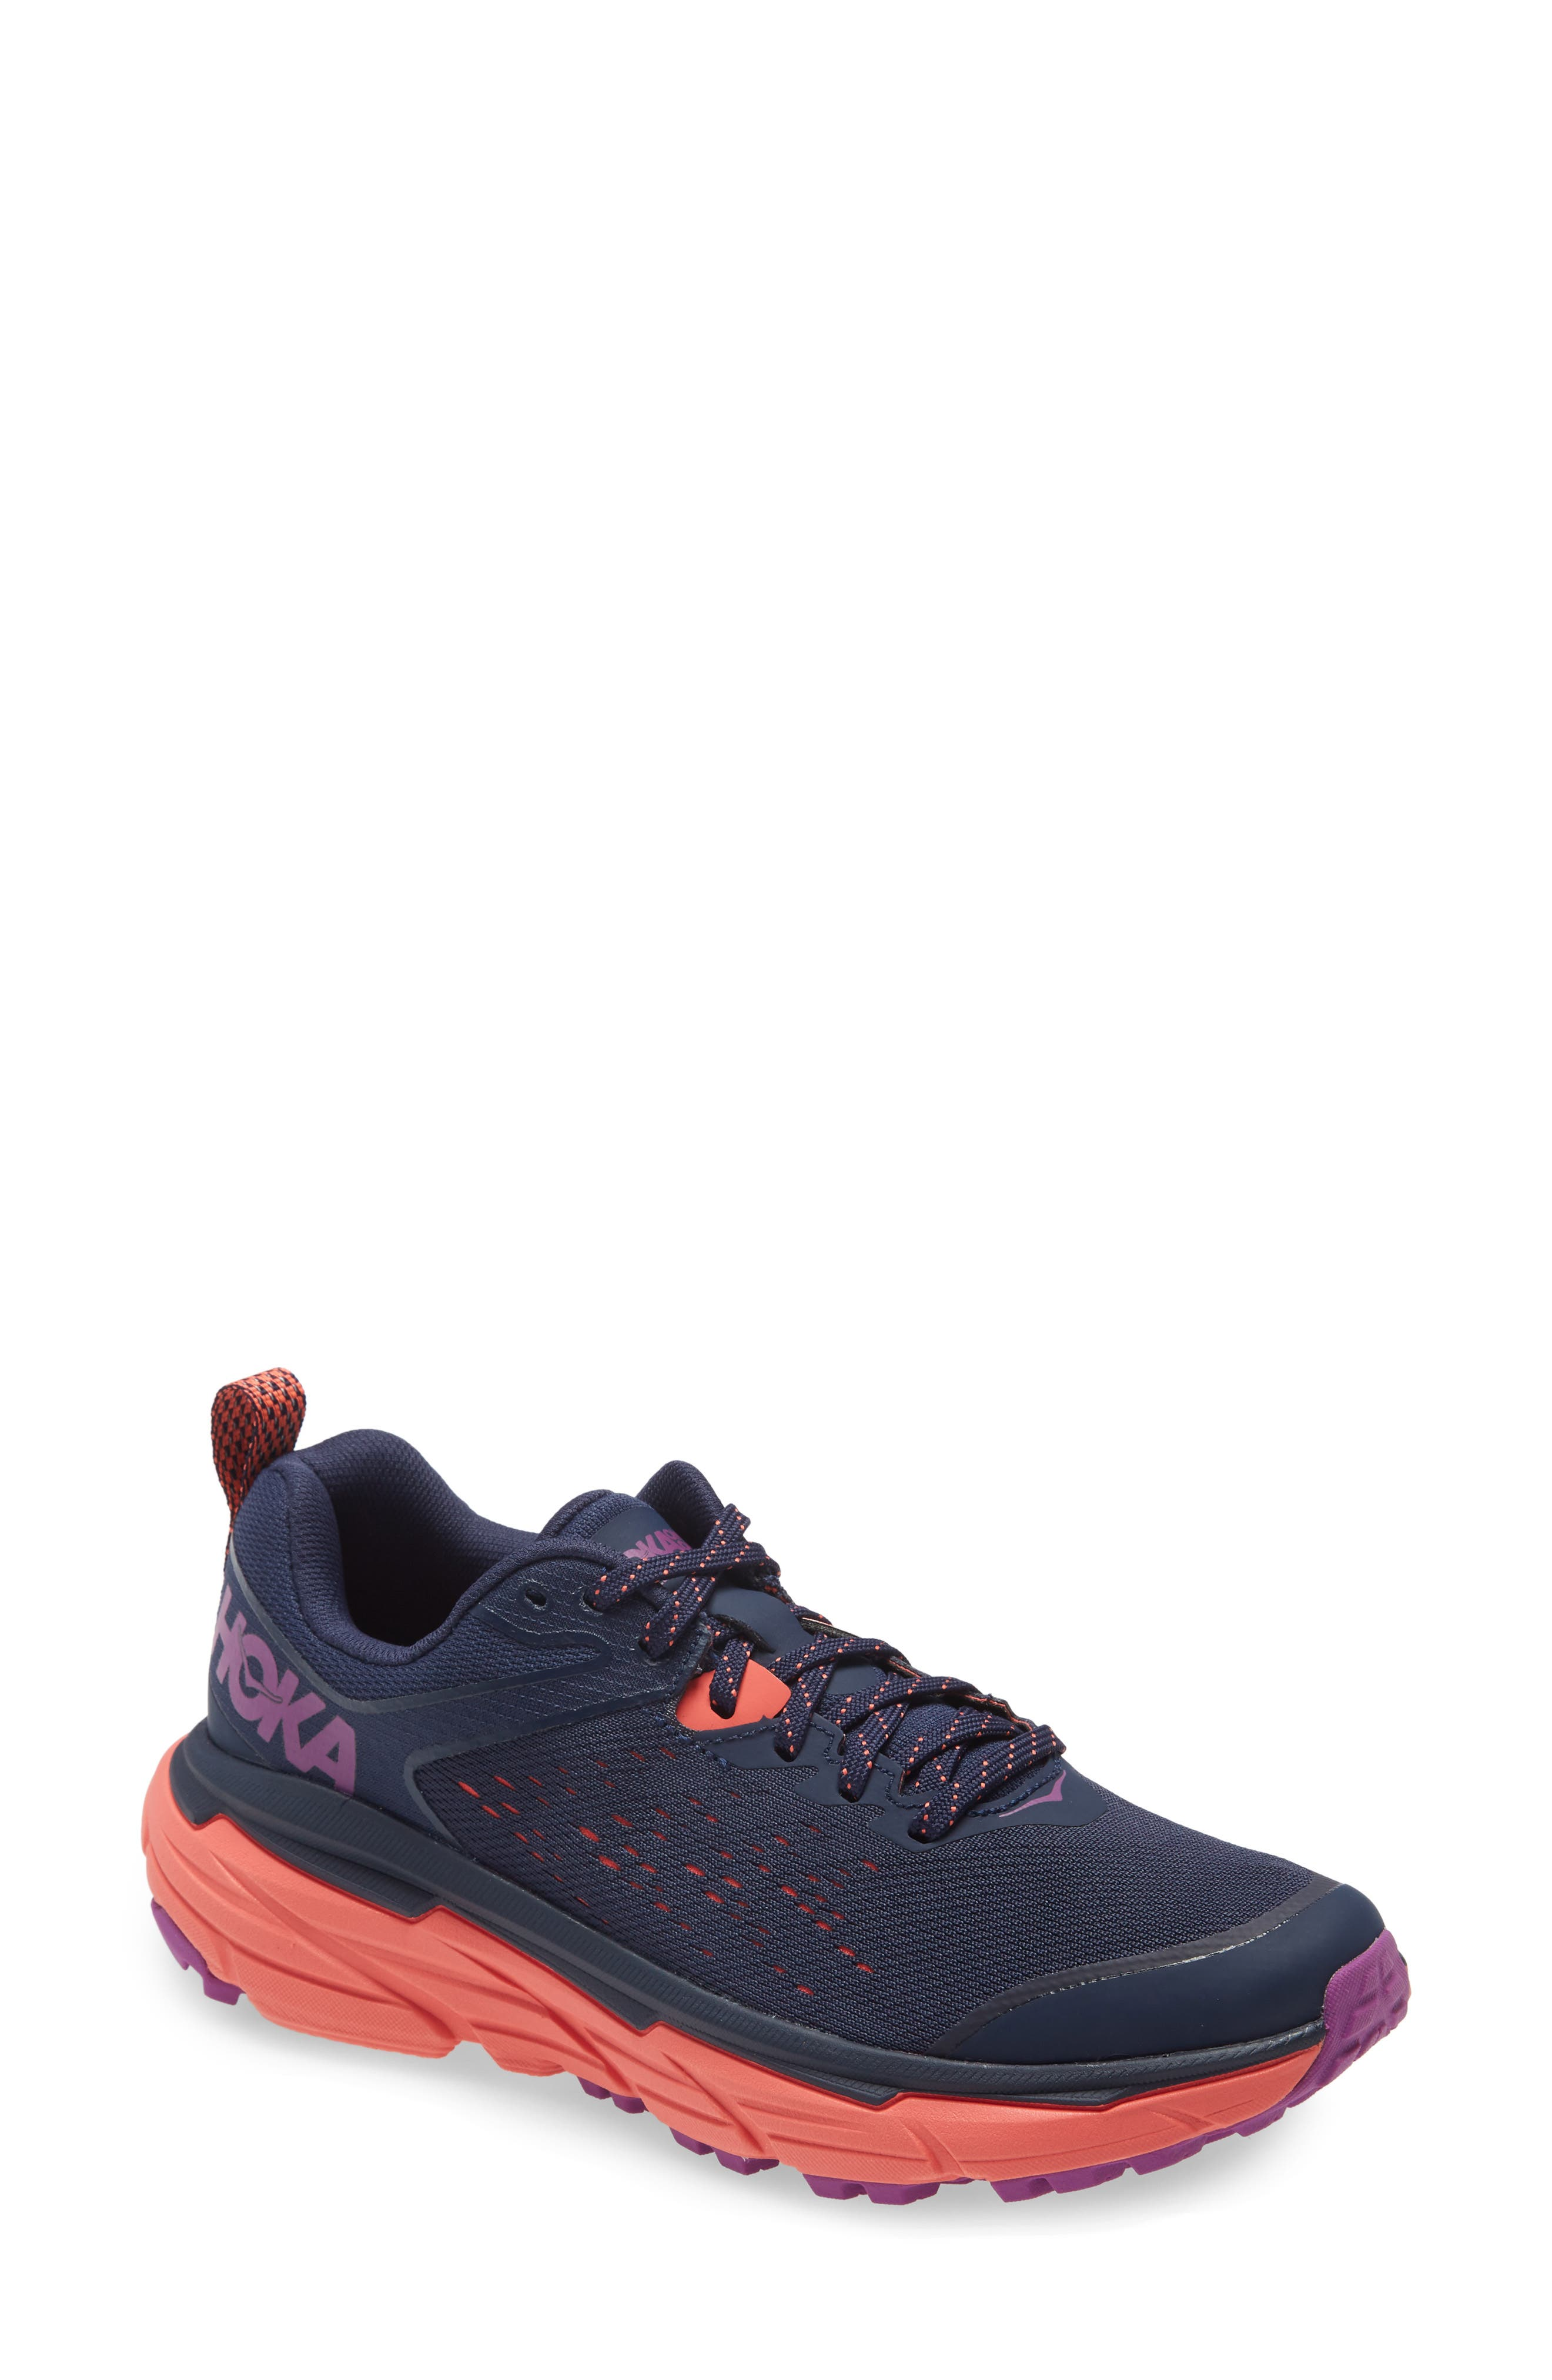 Challenger Atr 6 Trail Running Shoe